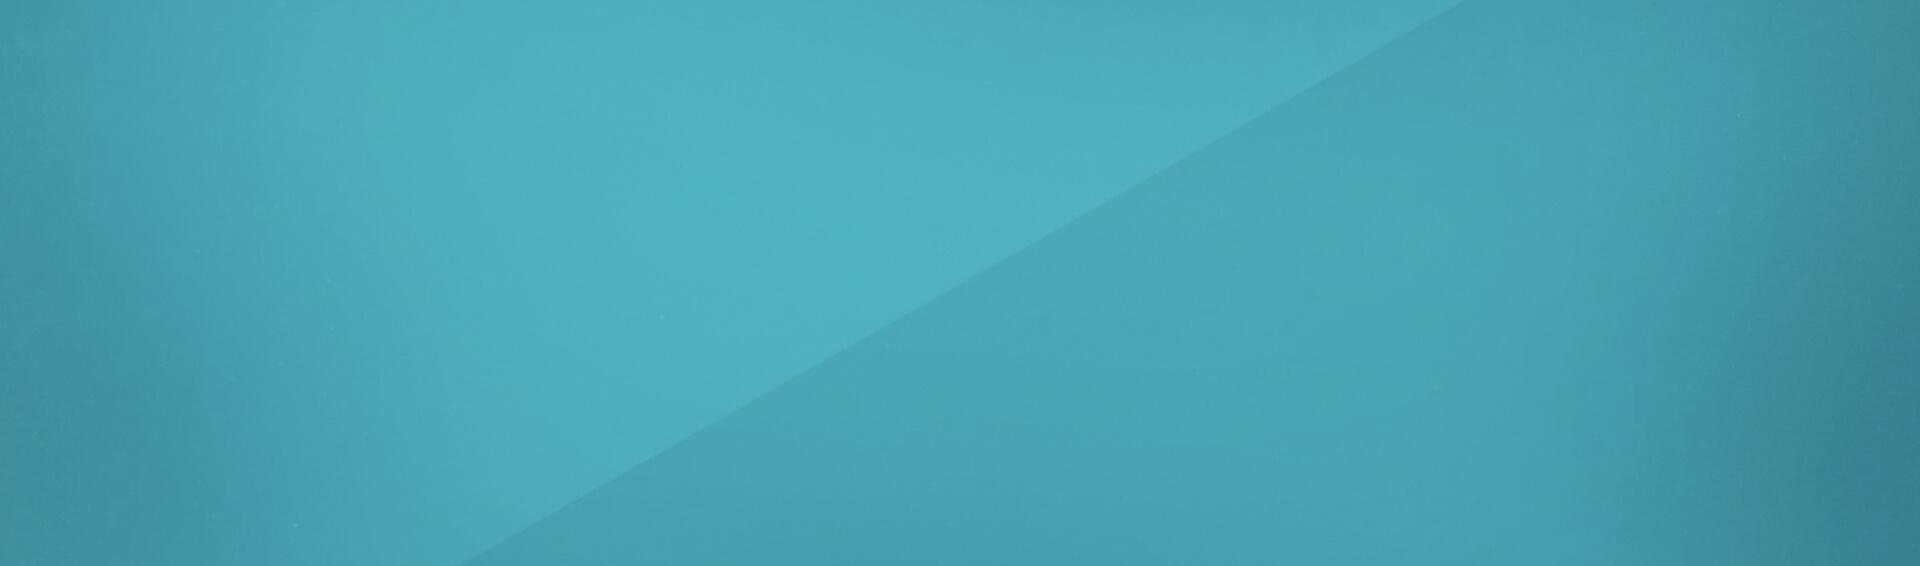 Background azul